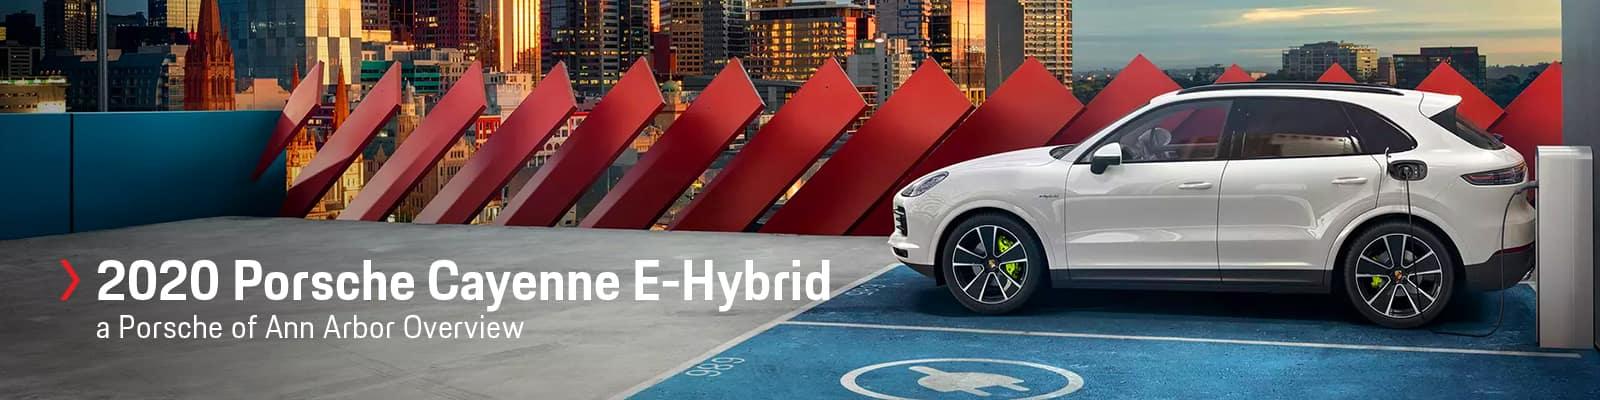 2020 Porsche Cayenne E-Hybrid Overview at Porsche Ann Arbor